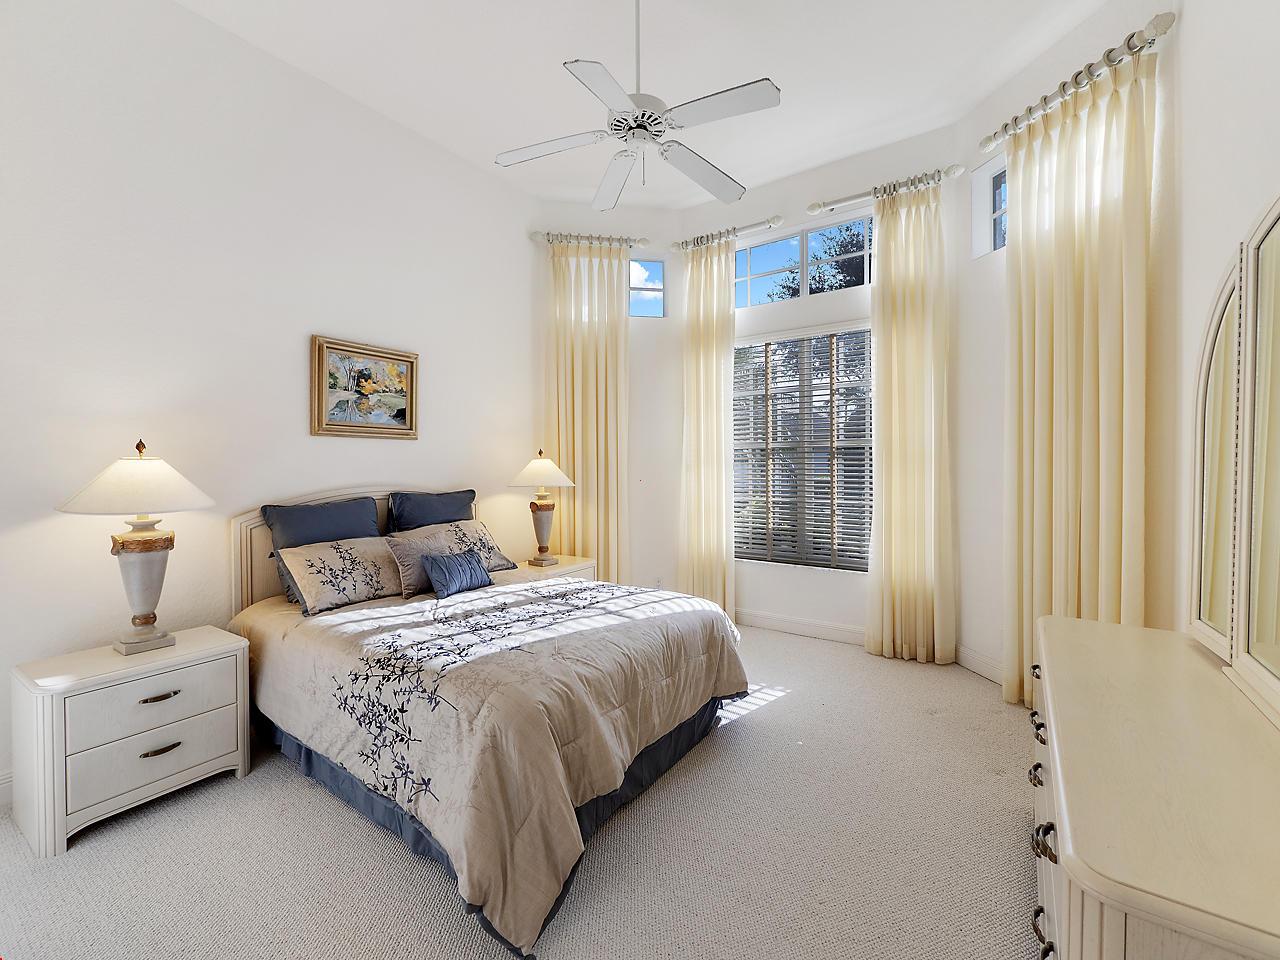 121 Banyan Isle Drive, Palm Beach Gardens, Florida 33418, 3 Bedrooms Bedrooms, ,4.1 BathroomsBathrooms,A,Single family,Banyan Isle,RX-10580507